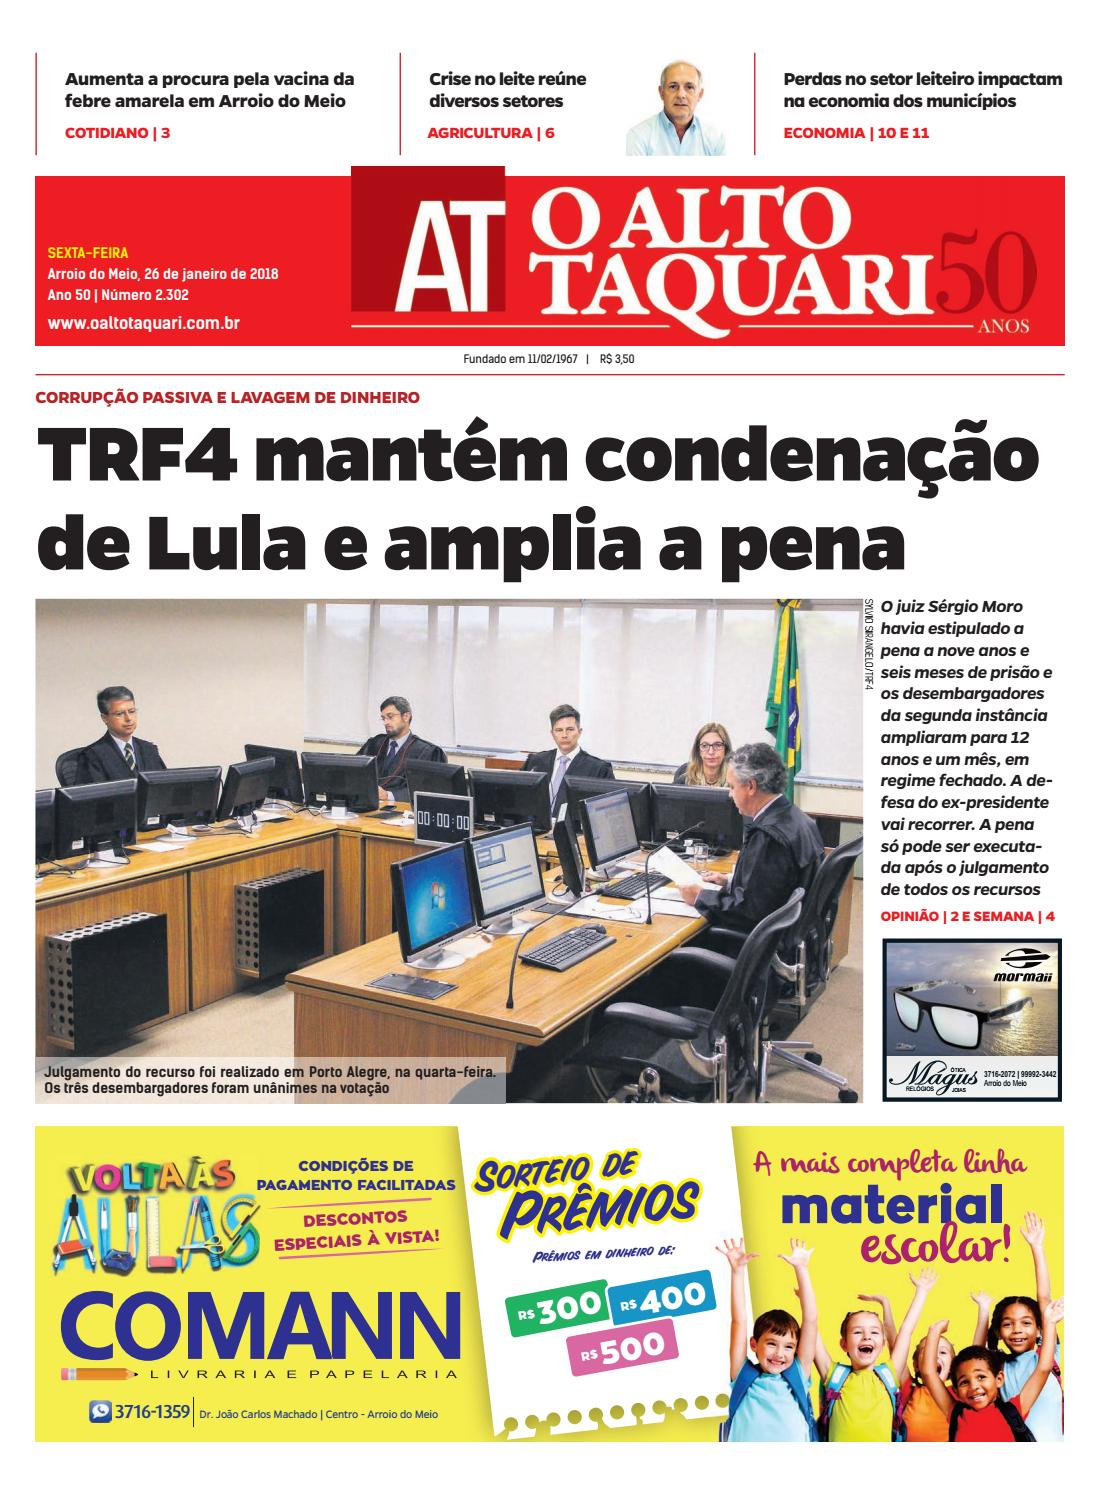 6c059d4e3eefd Jornal O Alto Taquari - 26 de janeiro de 2018 by Jornal O Alto Taquari -  issuu